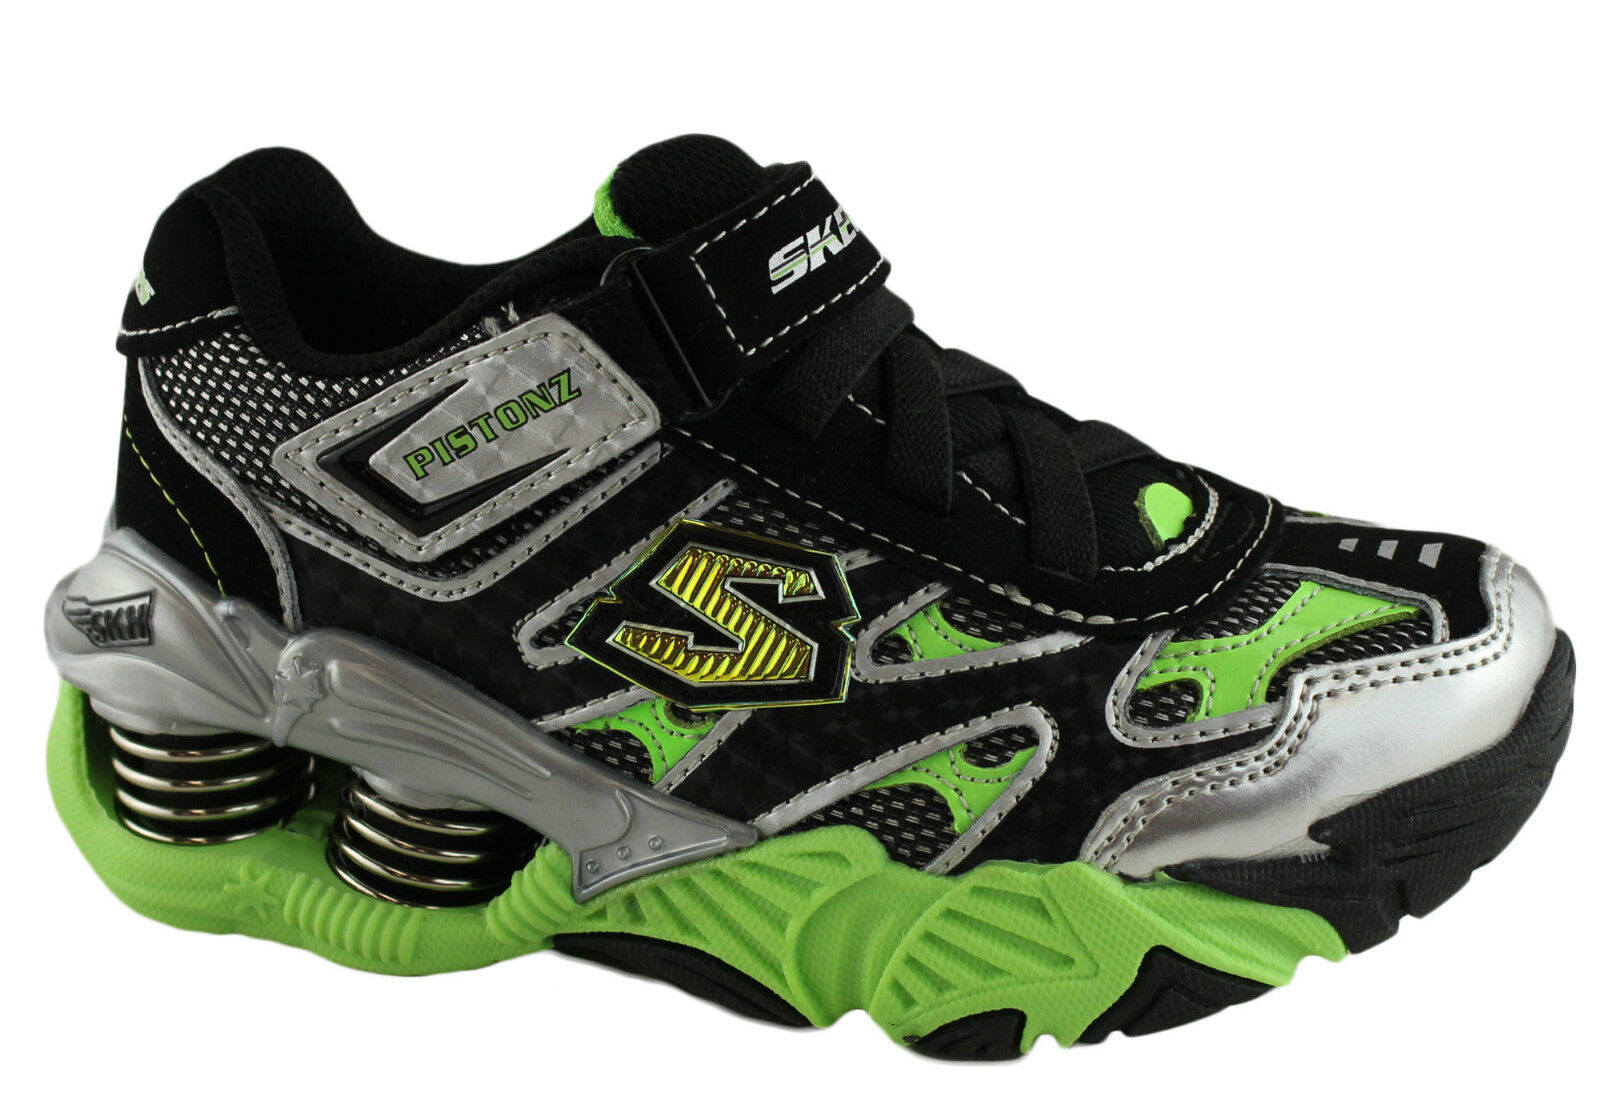 skechers shoes for boys. skechers shoes for boys c